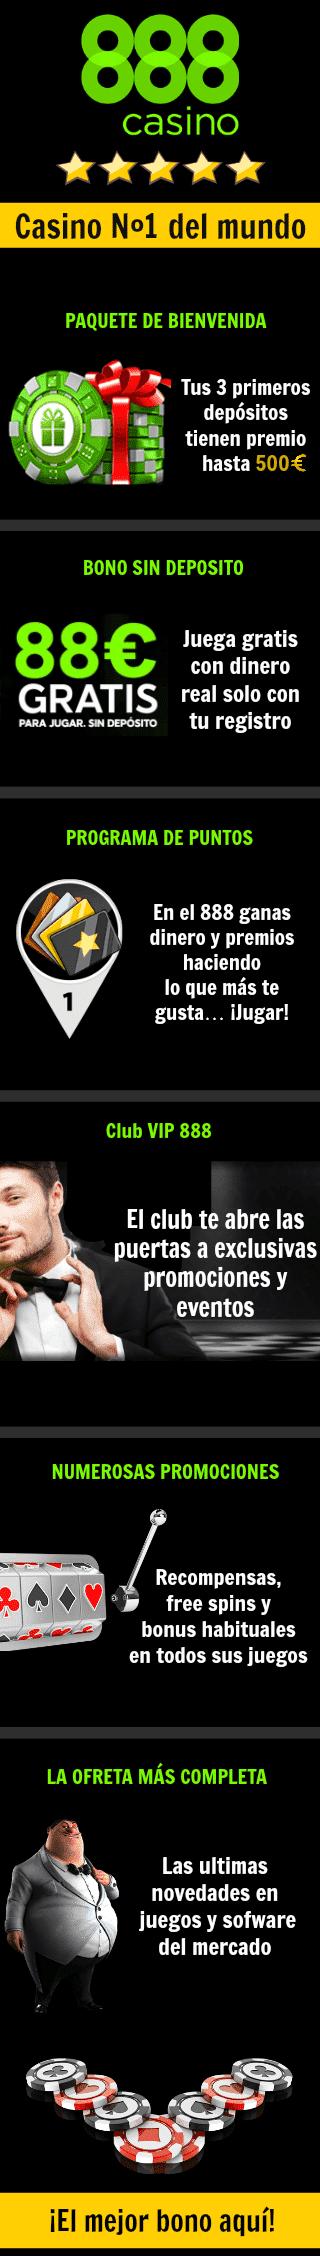 888 casino online promociones